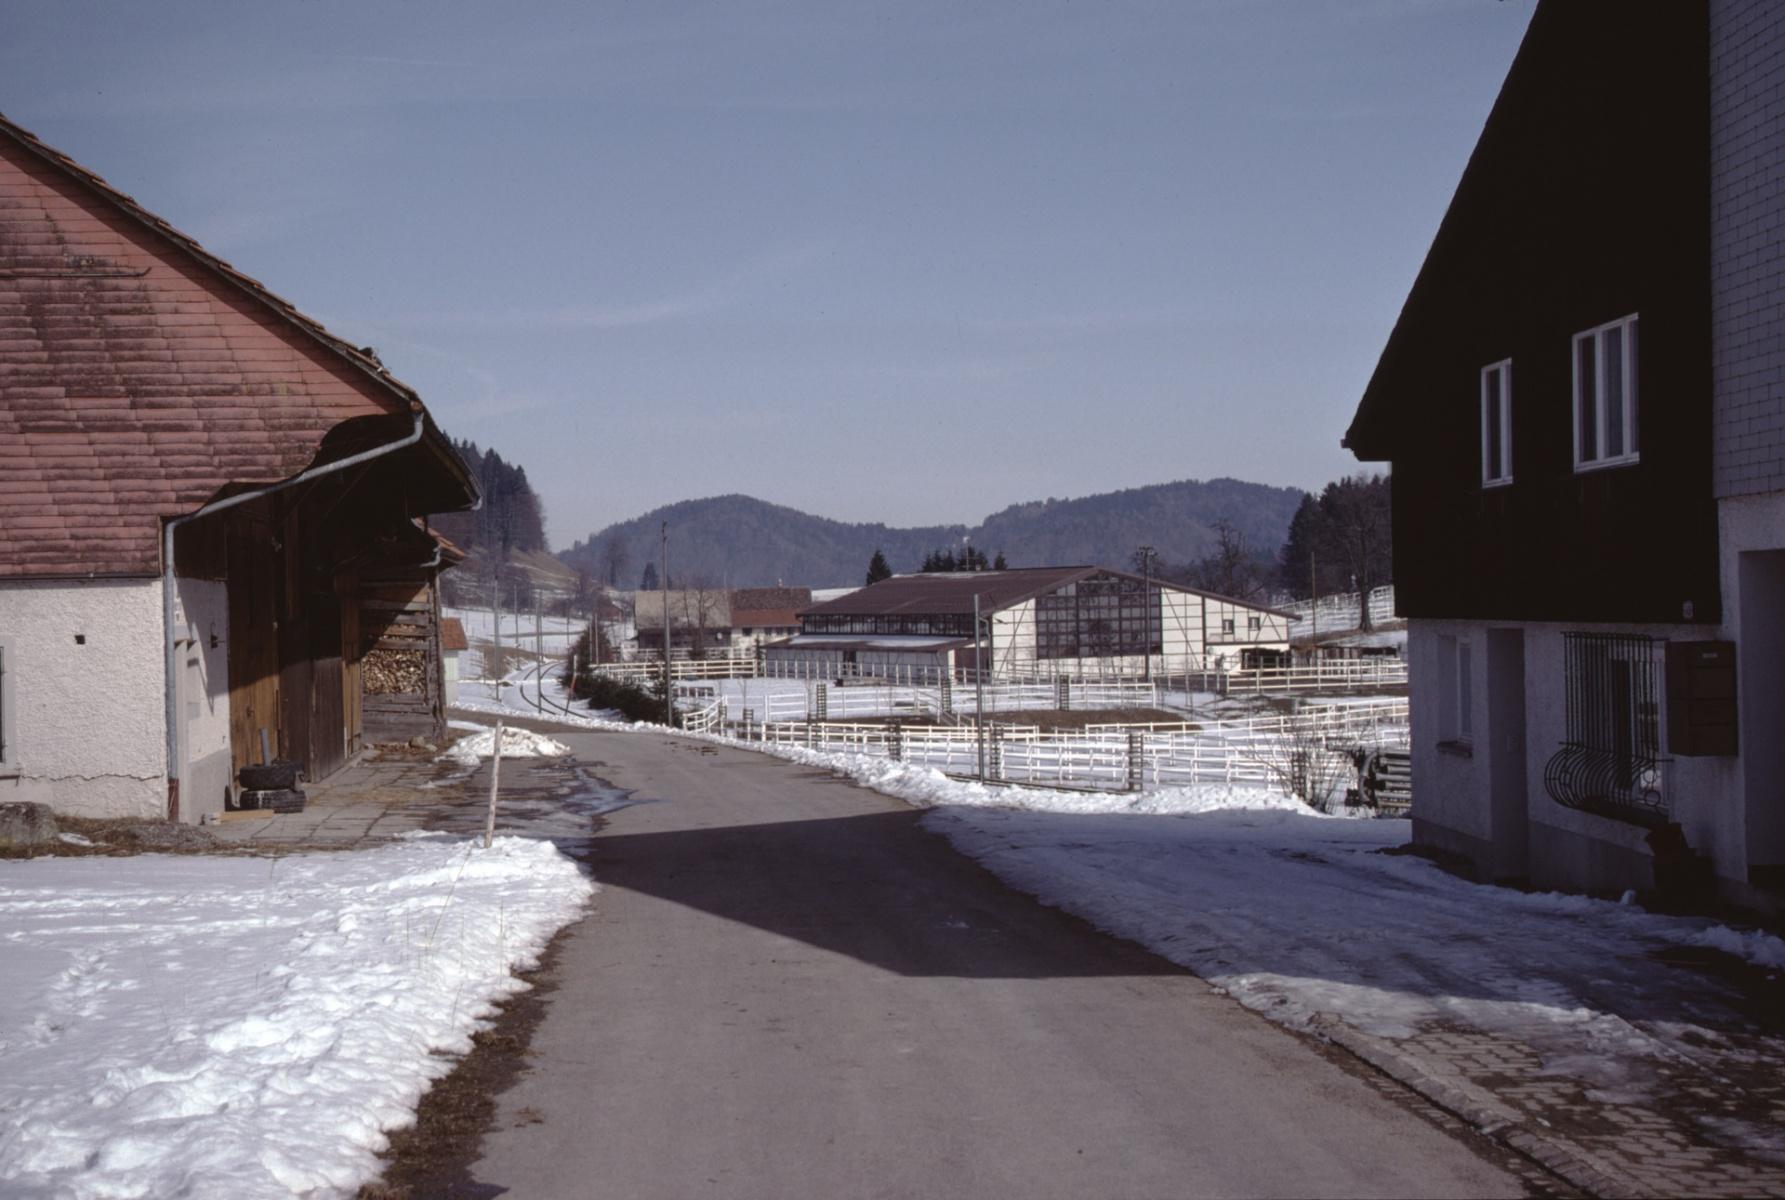 Bussental Haus U. Hauser - Reithalle